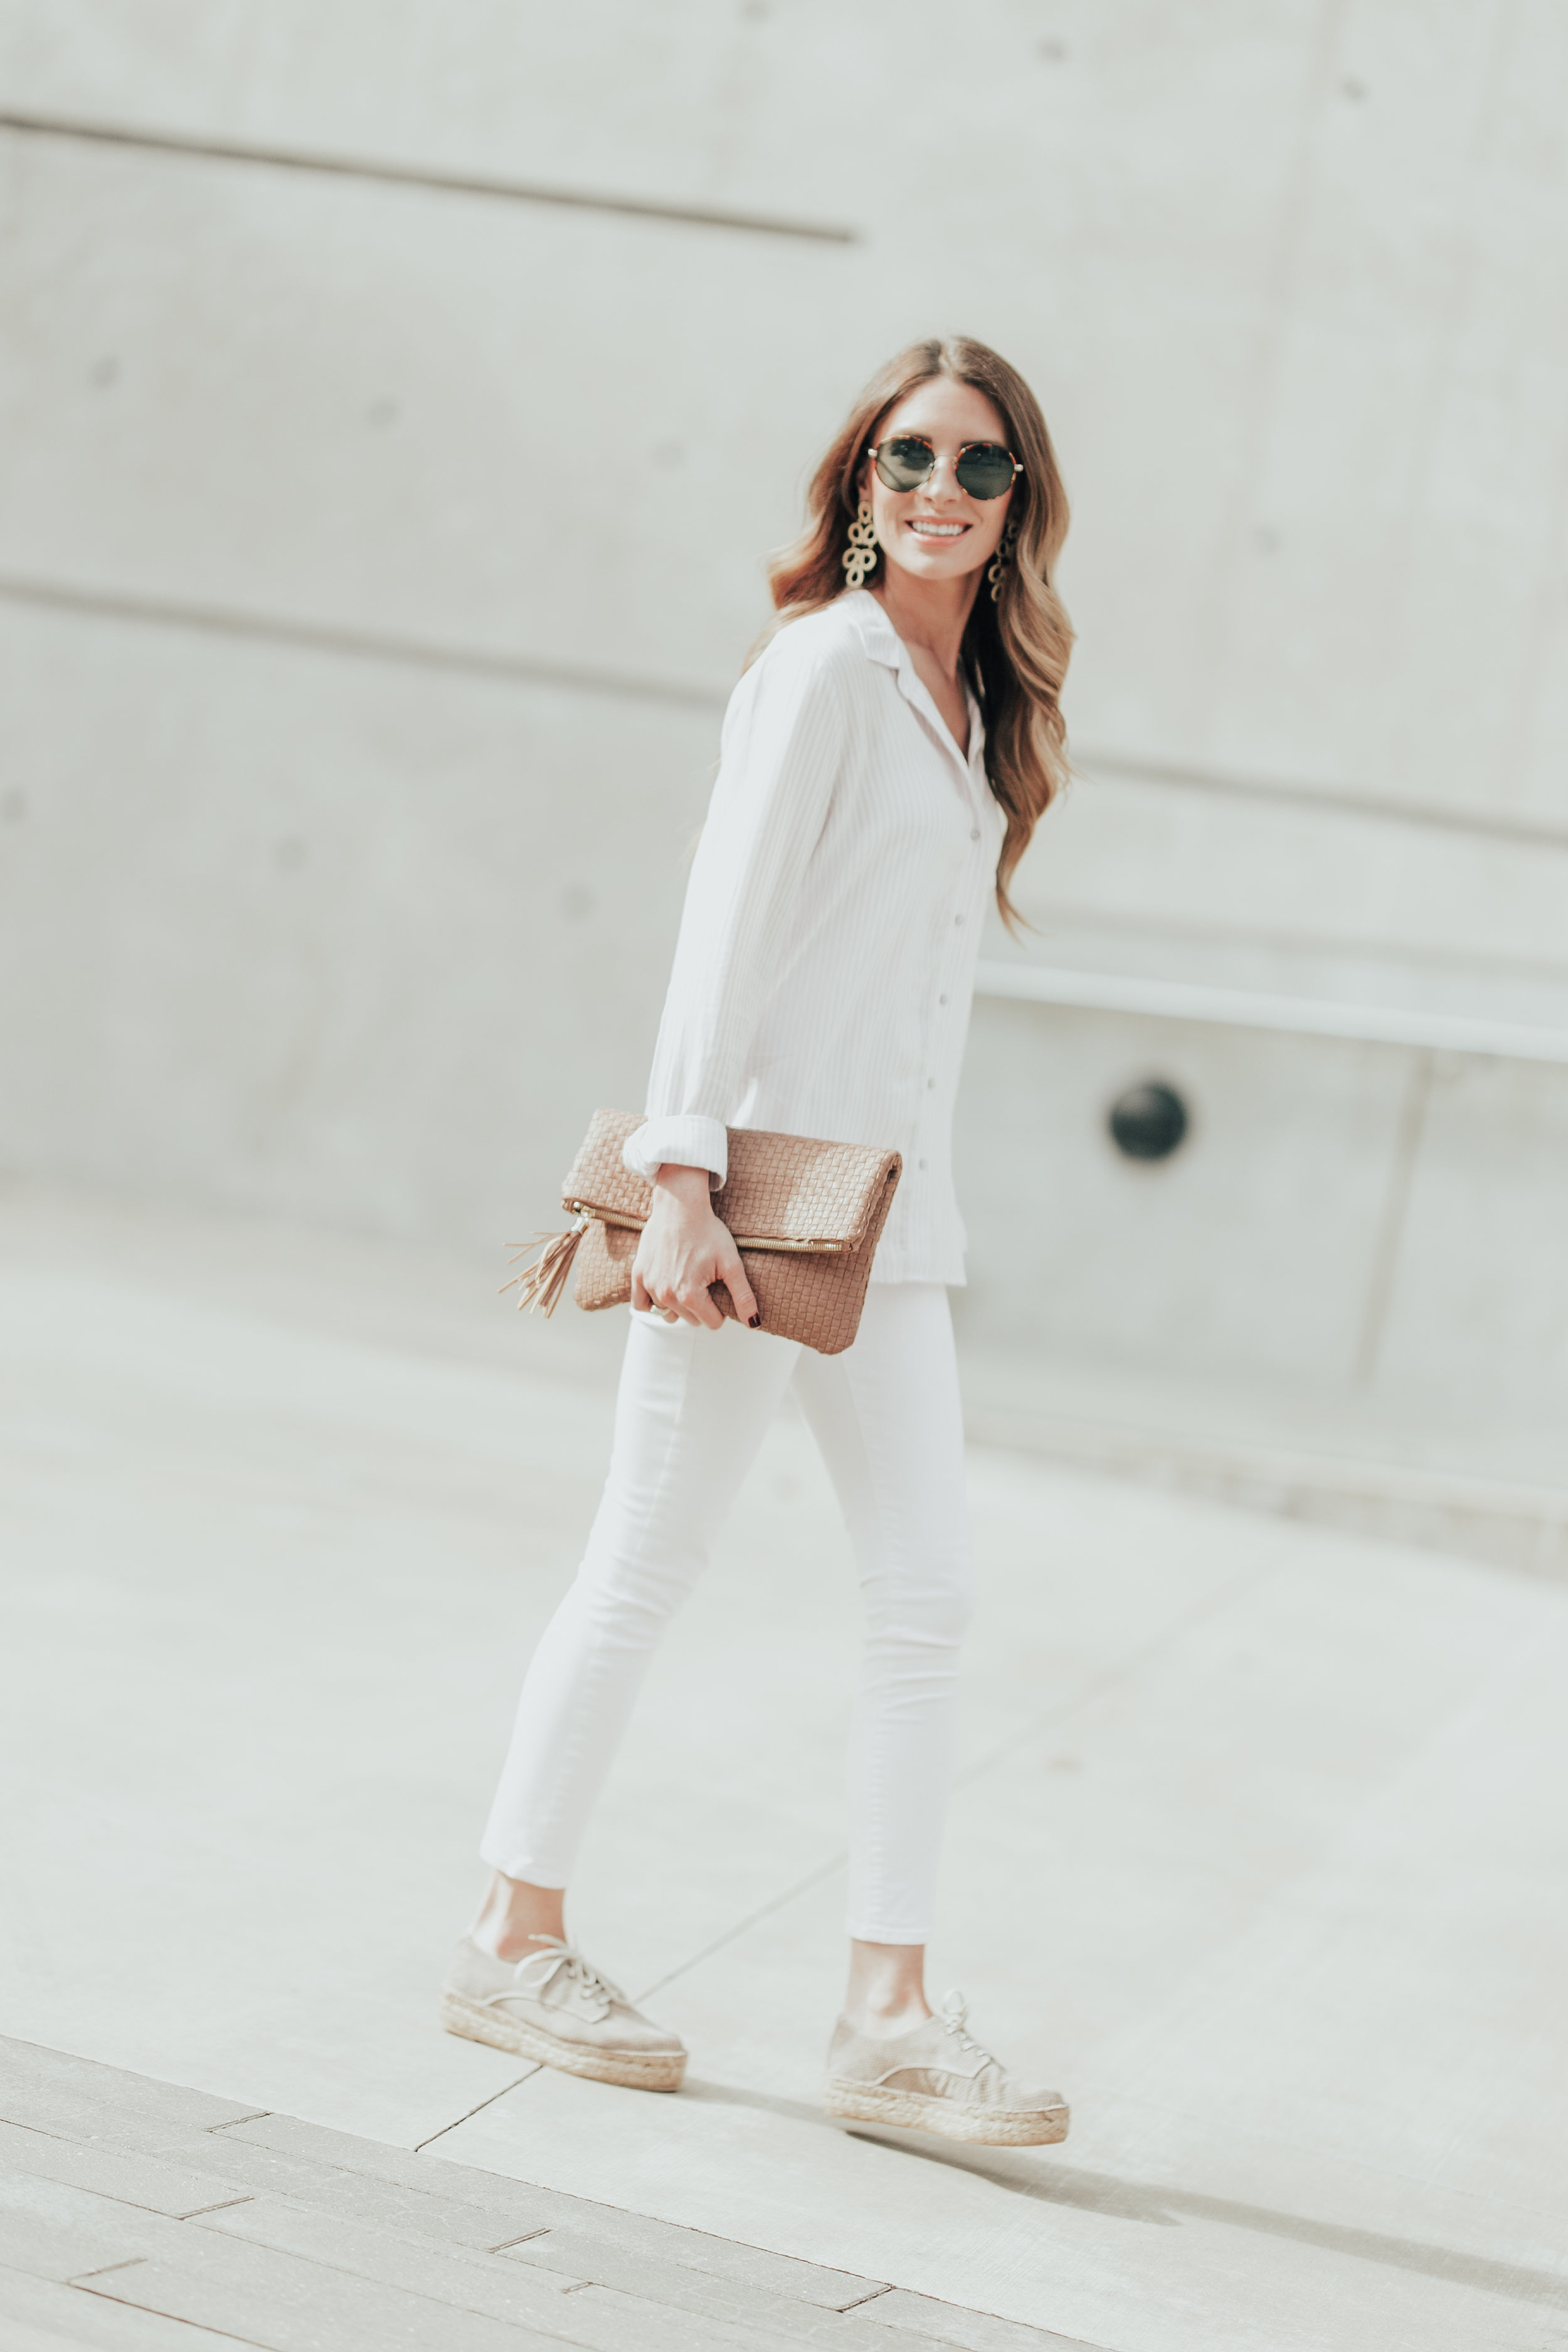 All White + Espadrilles